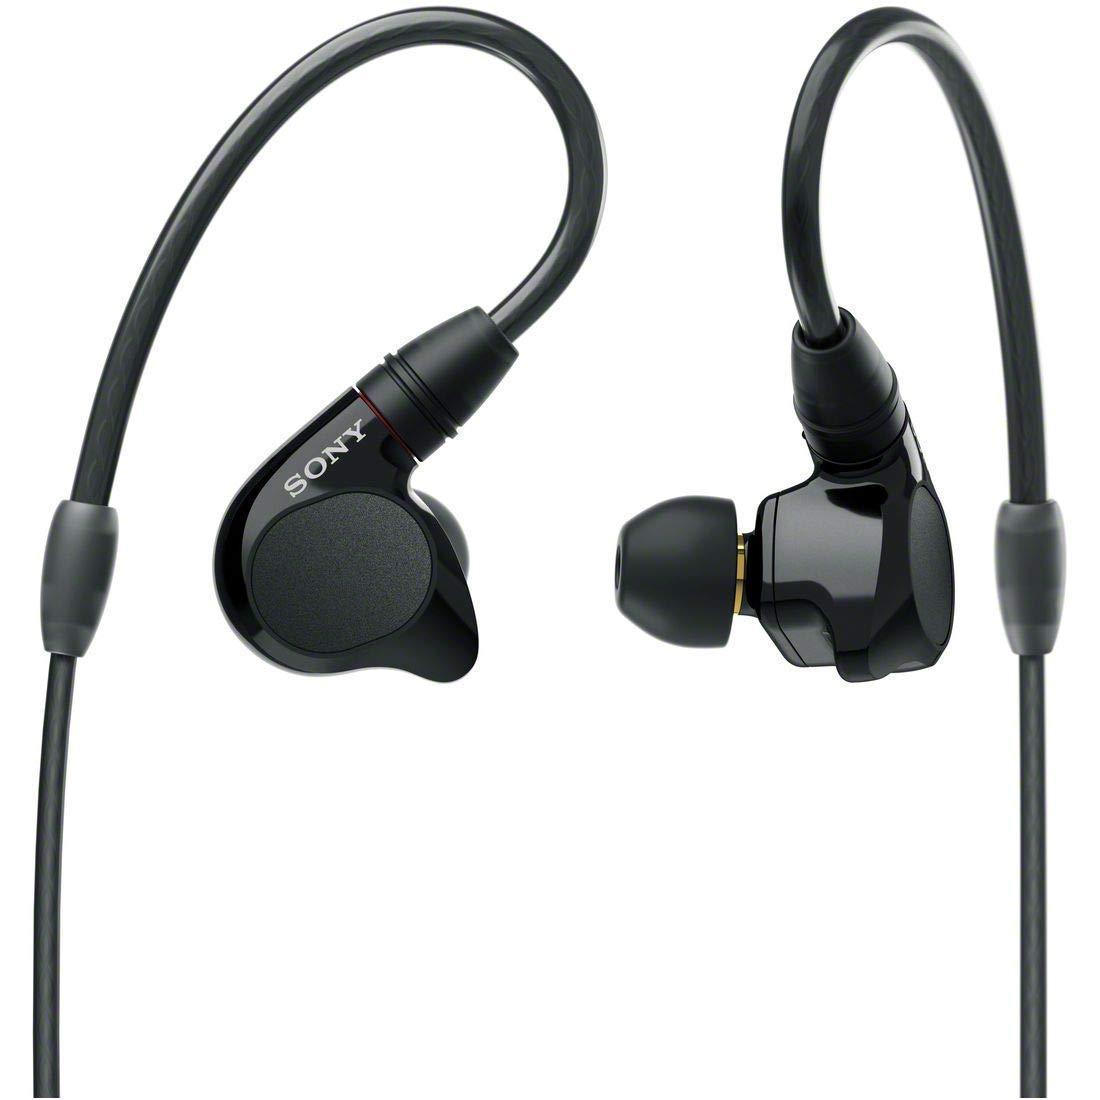 Jual Kejutan Diskaun Mem Belah Sony Hear Mdr Ex750bt Bluetooth In Wireless Headset Viridian Blue Headphones Over Ear Noise Cancelling Price Singapore